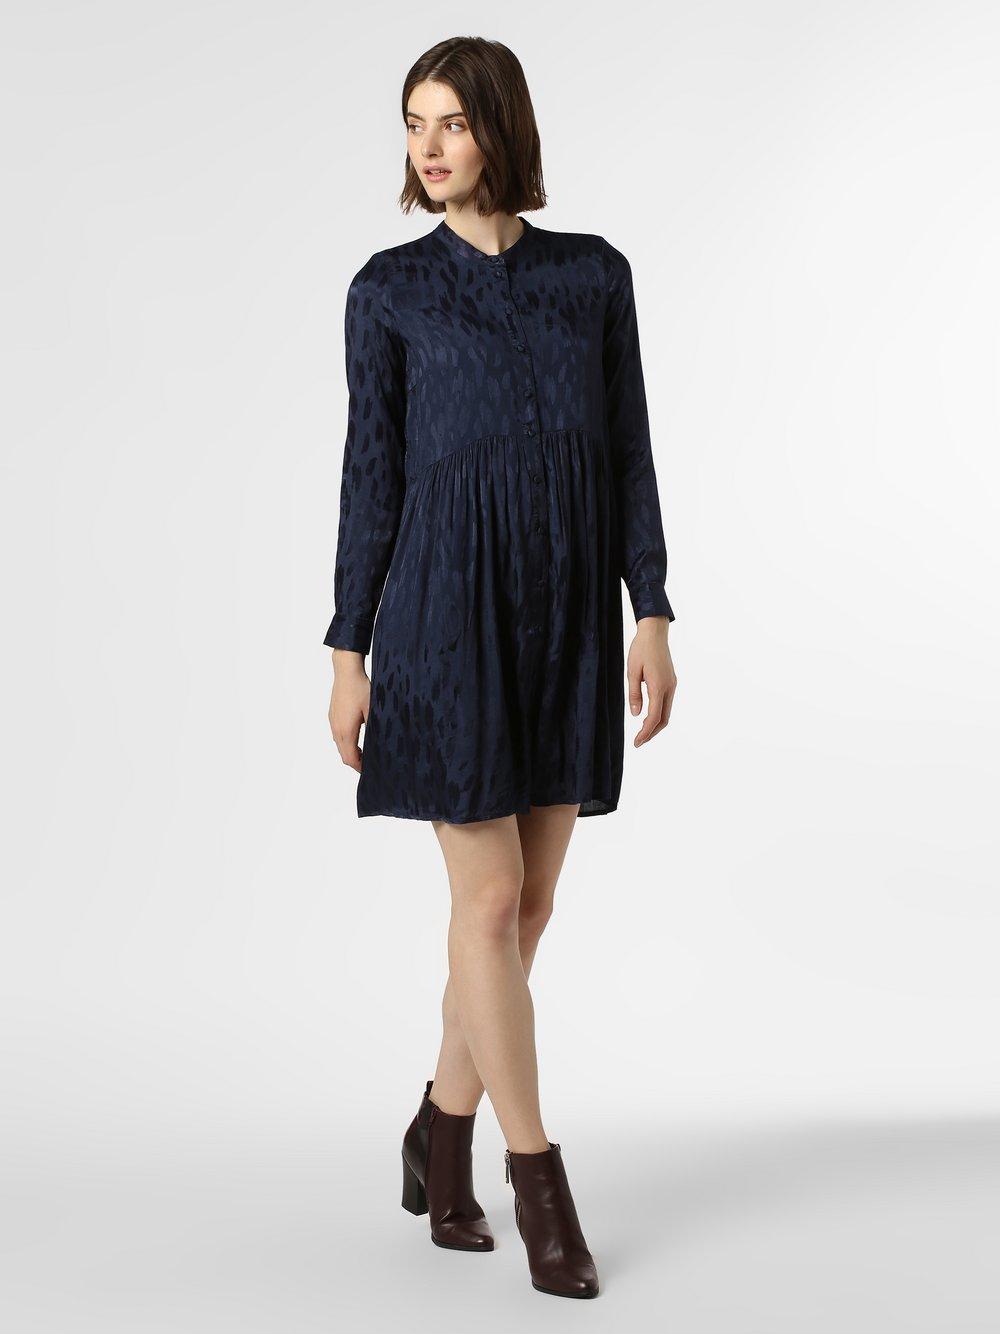 Y.A.S – Sukienka damska – Yasmerta, niebieski Van Graaf 447423-0001